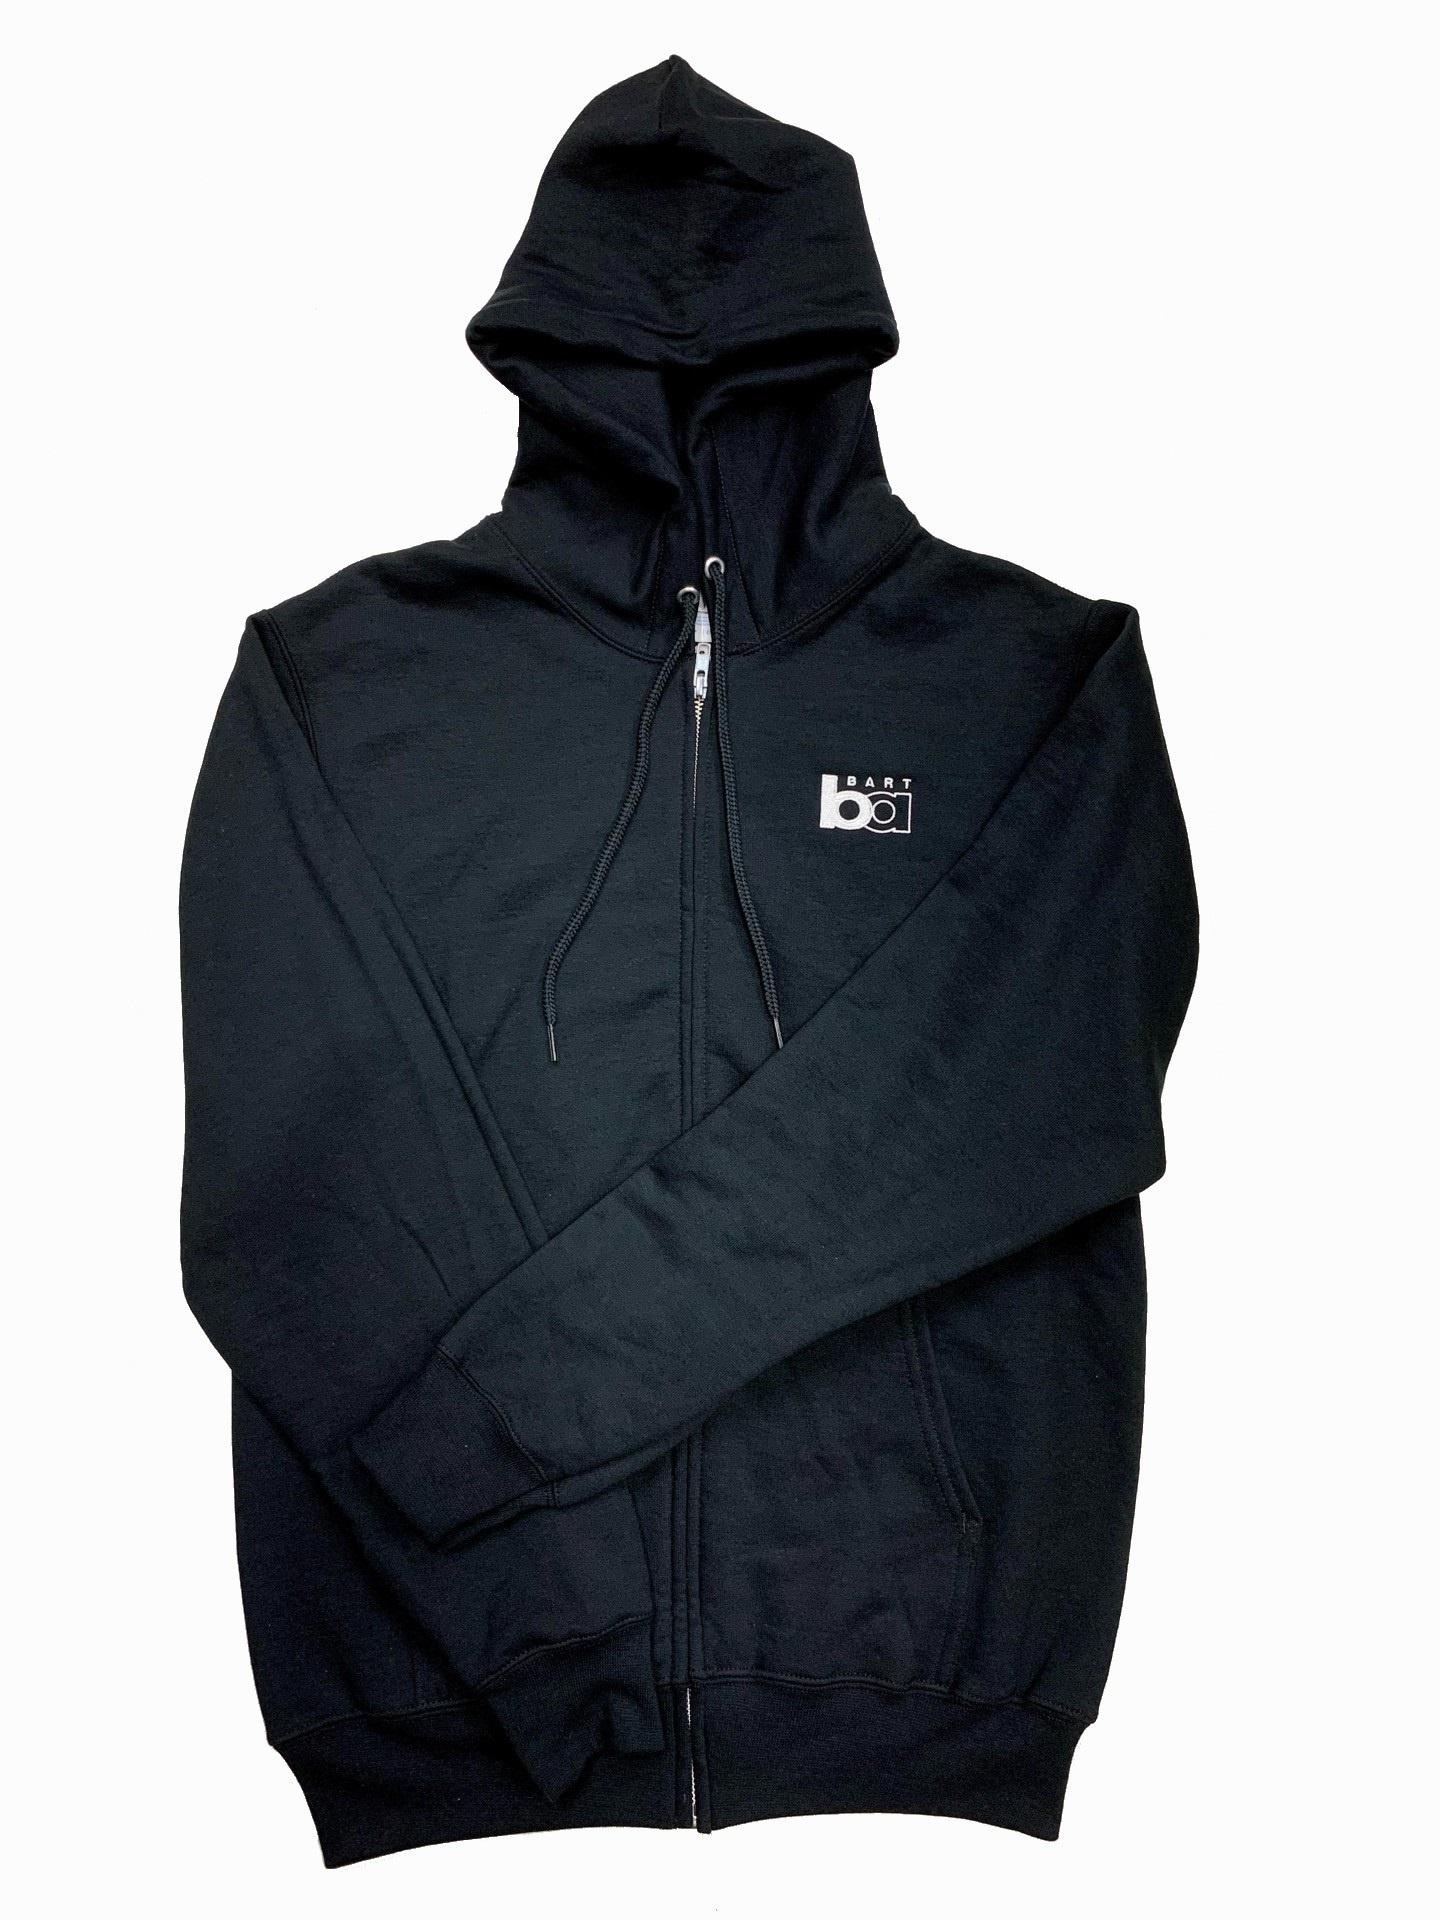 Port & Company BART Hoodie Unisex (Price: $28-34)